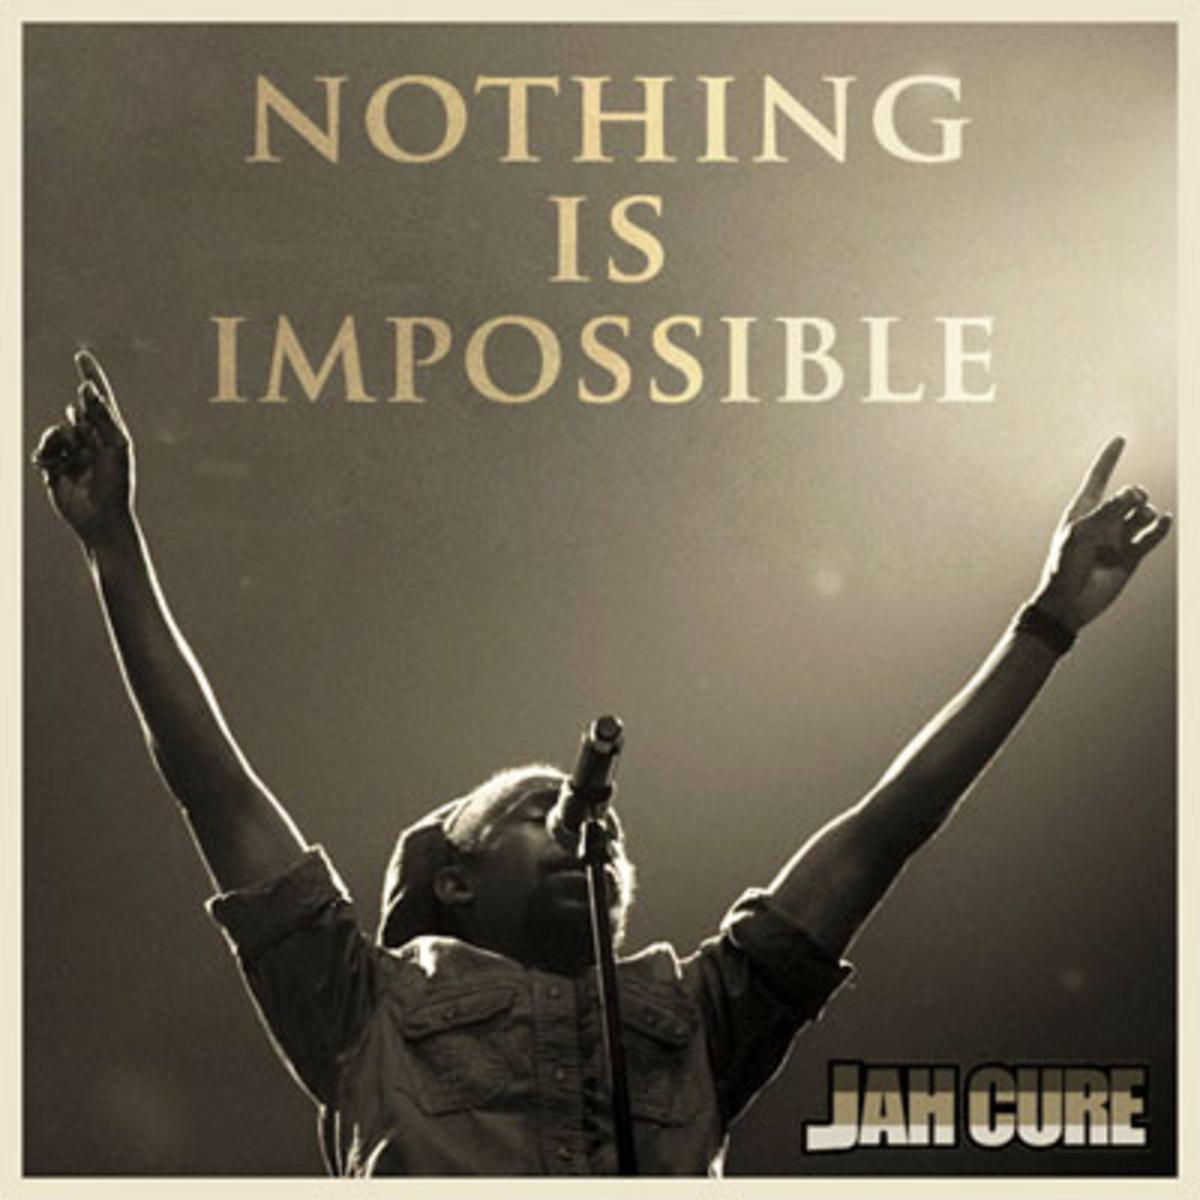 jahcure-nothingisimpossible.jpg